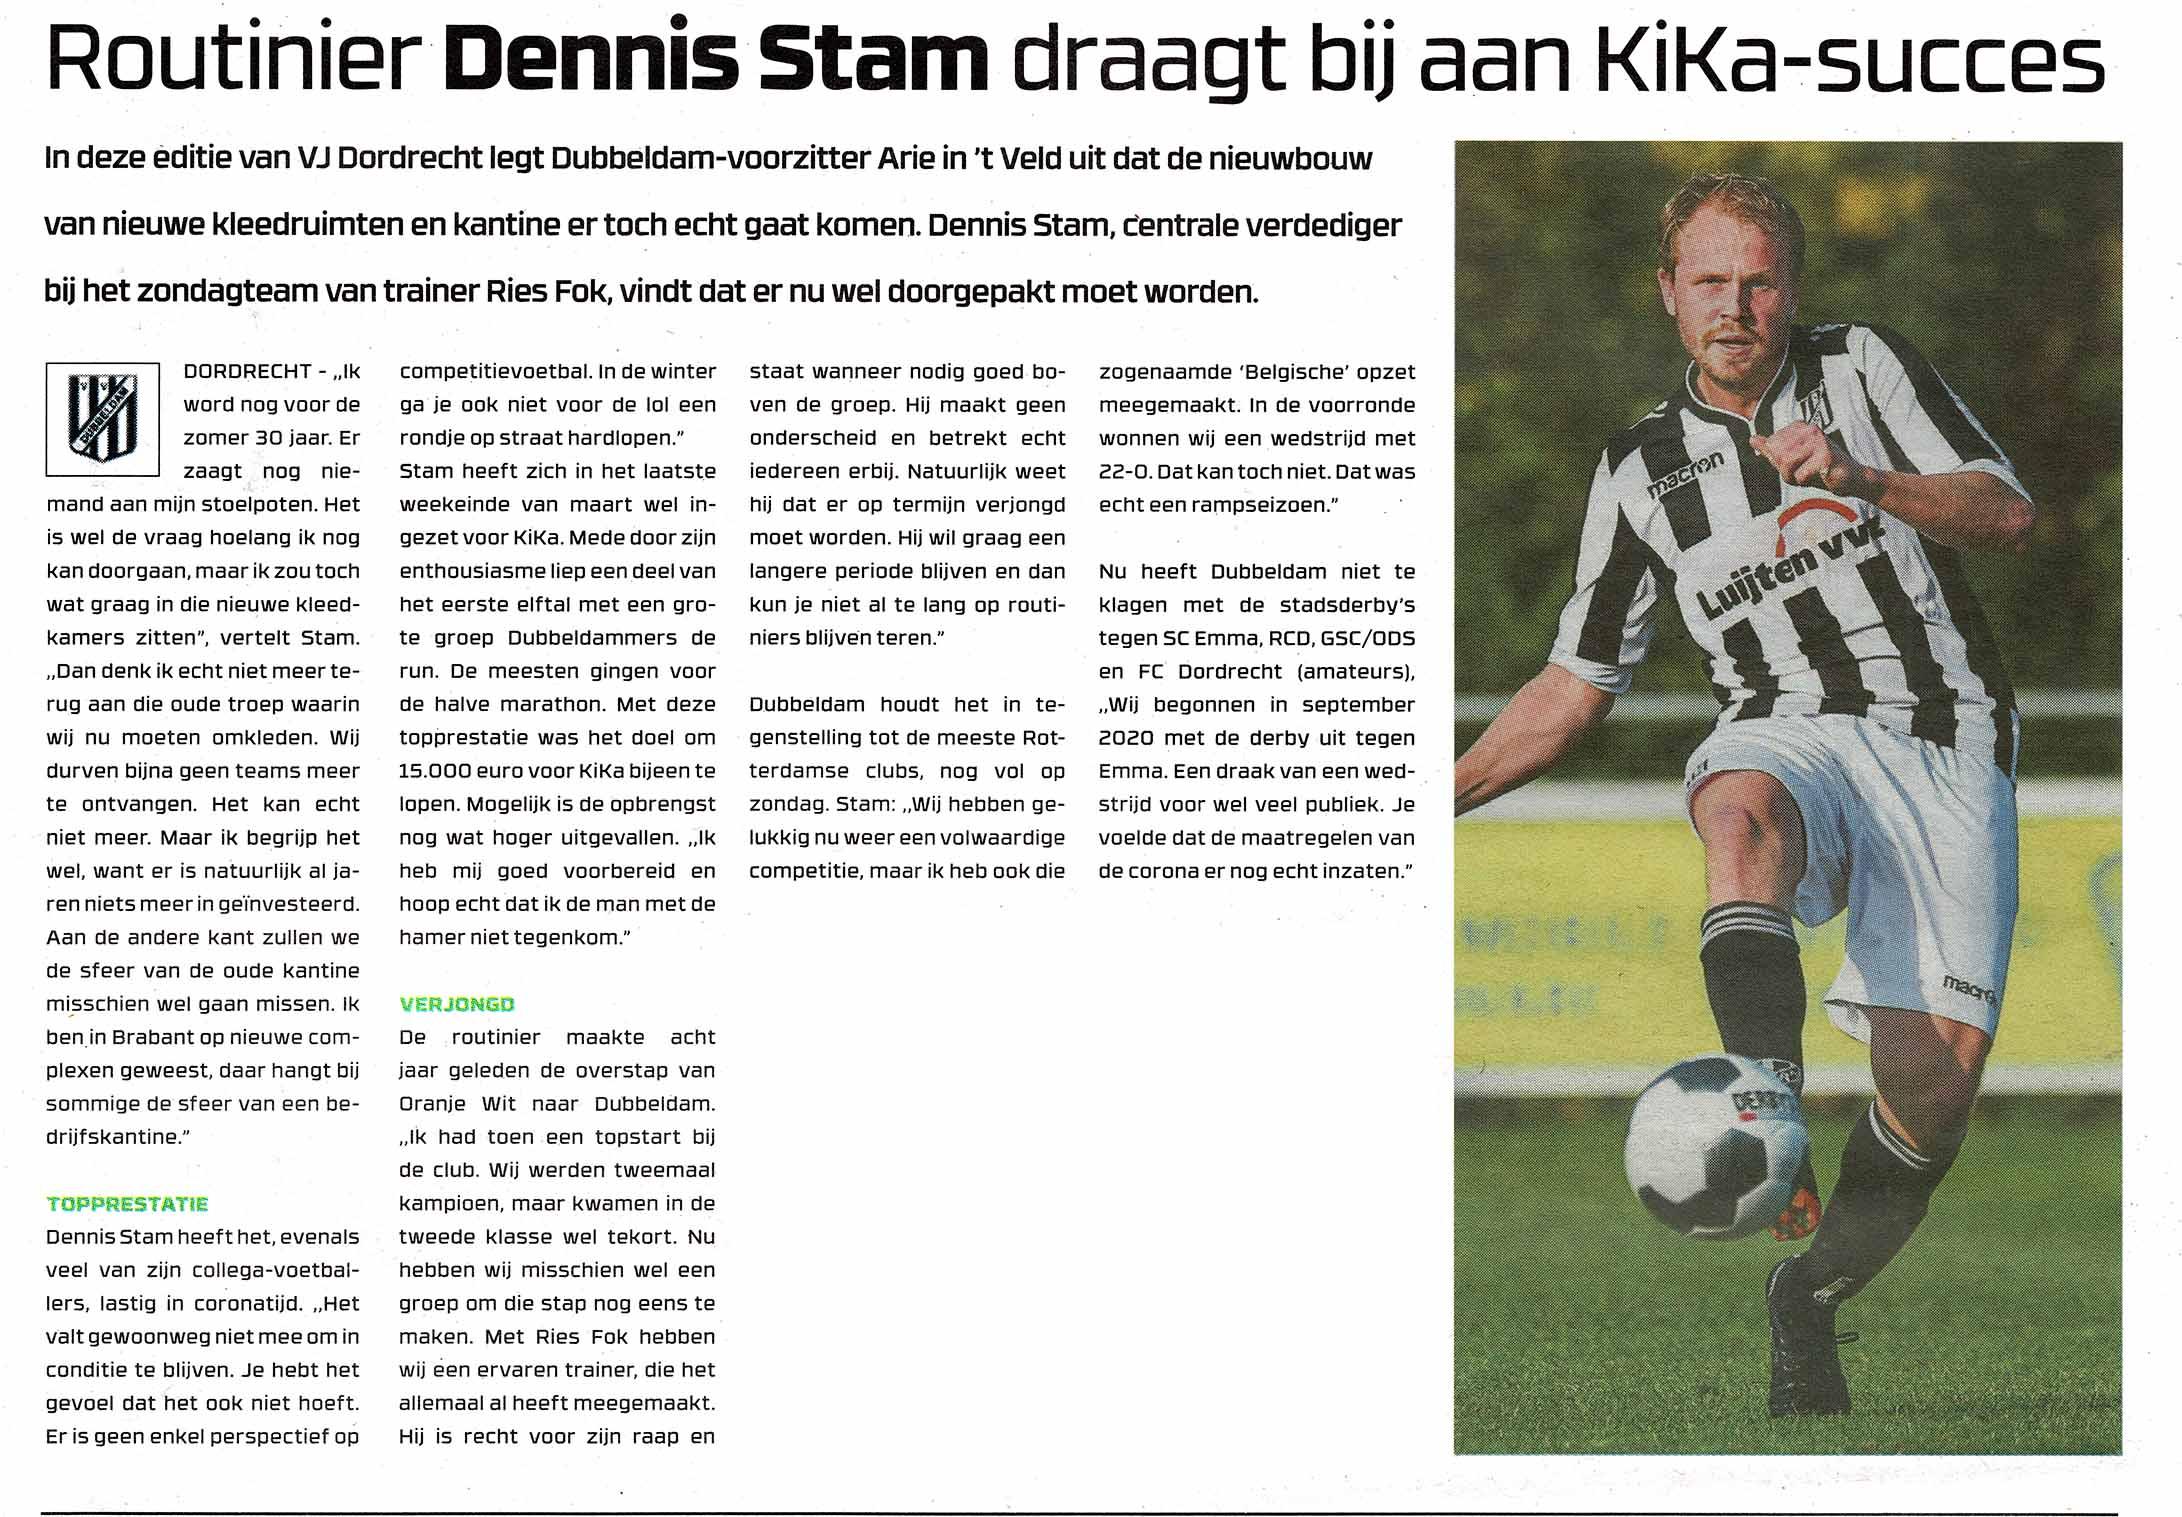 Dennis Stam in voetbaljournaal over KiKa